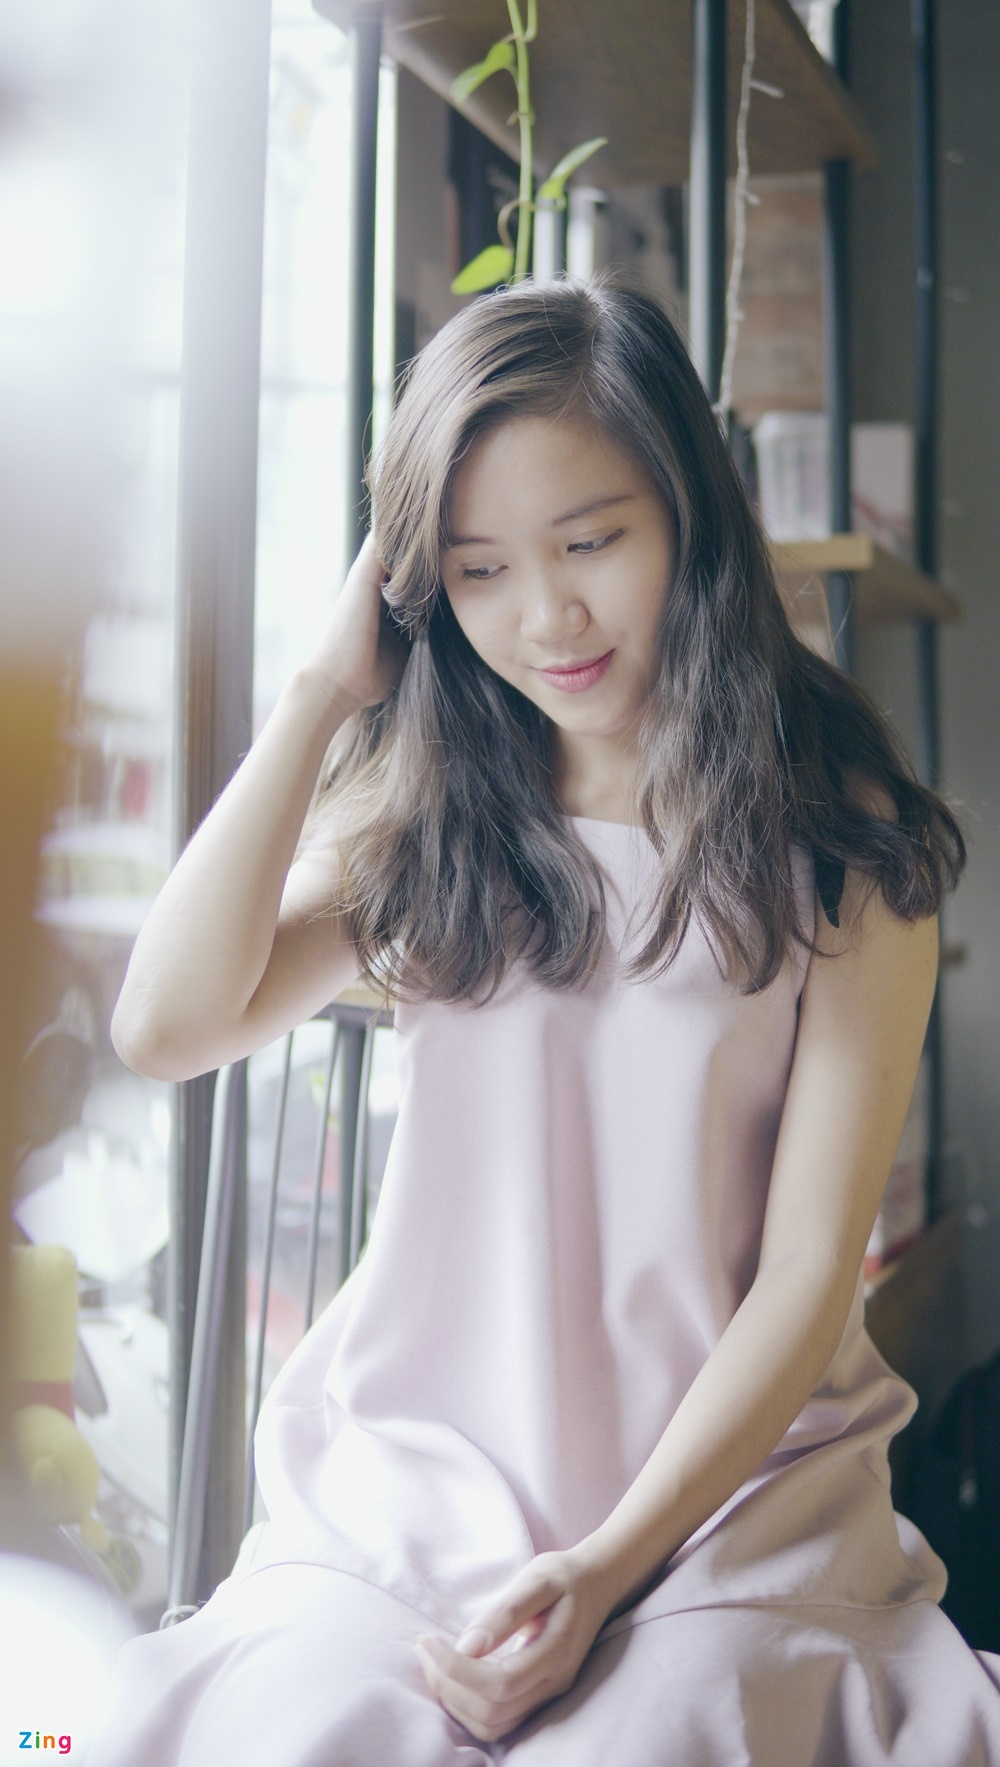 9X 'con nha nguoi ta': Xinh dep, IELTS 8.0, thu khoa kep DH Su pham hinh anh 4